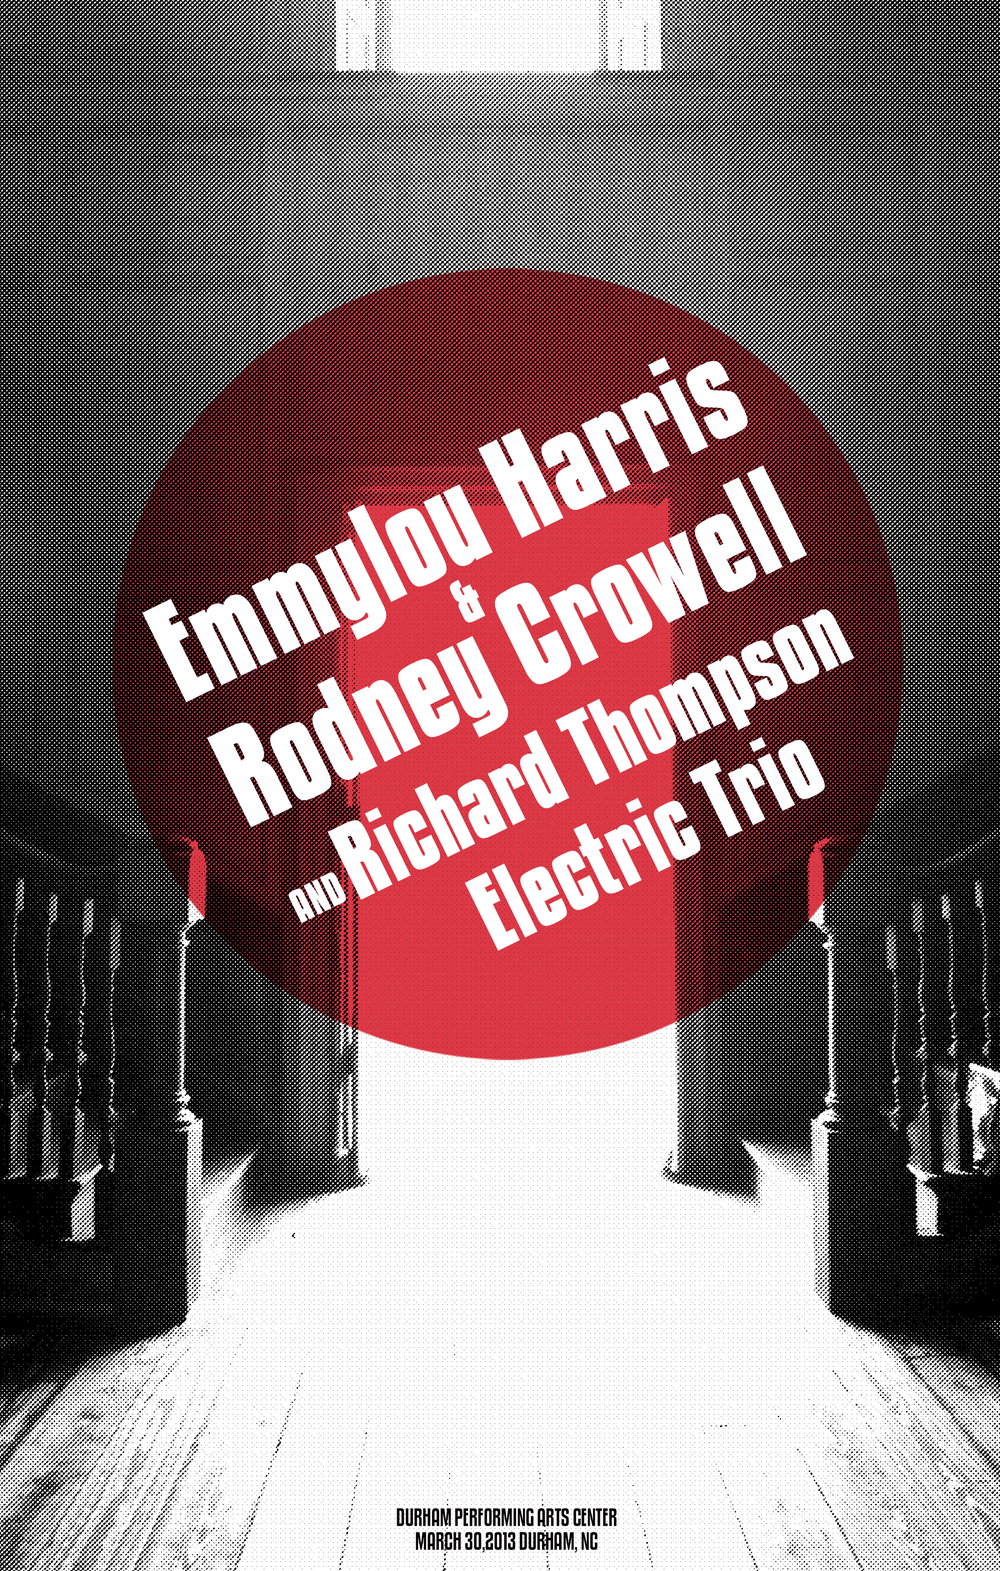 Emmylou Harris, Rodney Crowell, and Richard Thompson Electric Trio